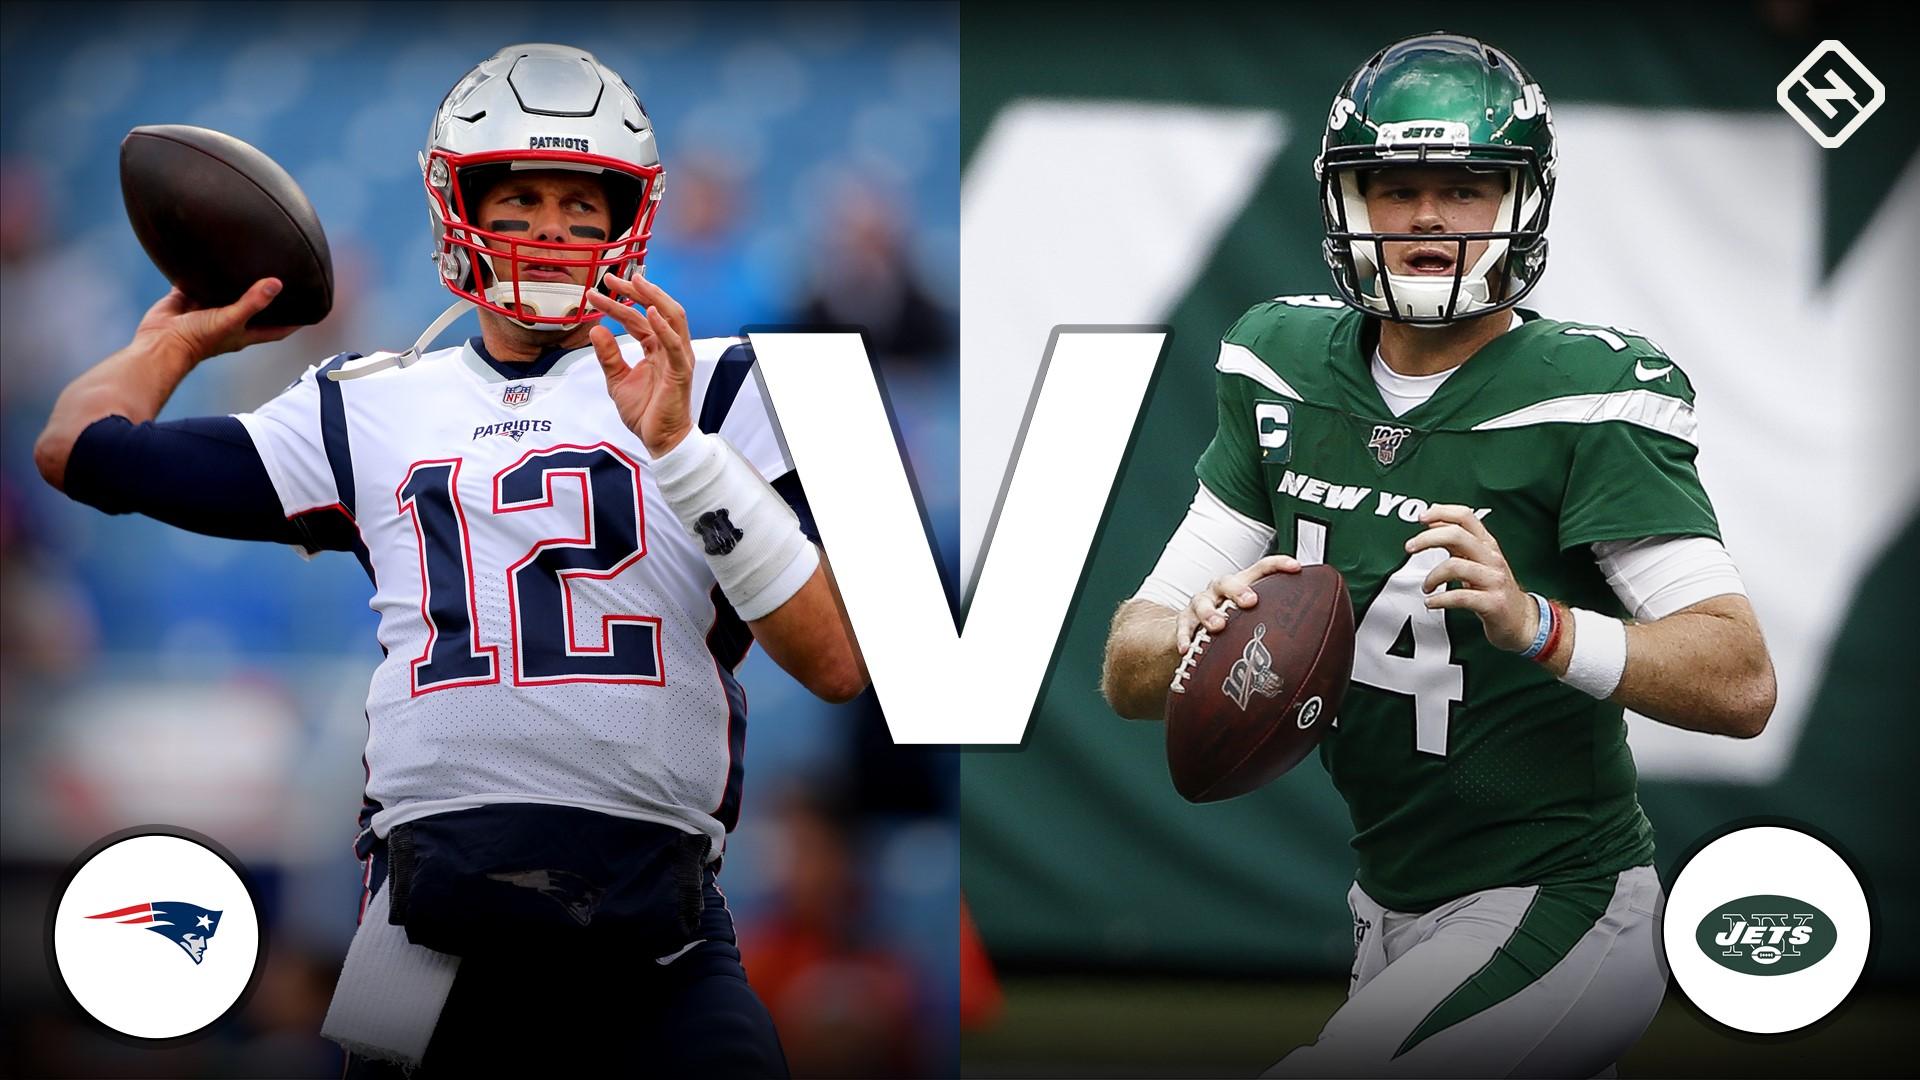 Patriots vs jets betting predictions best soccer tips betting